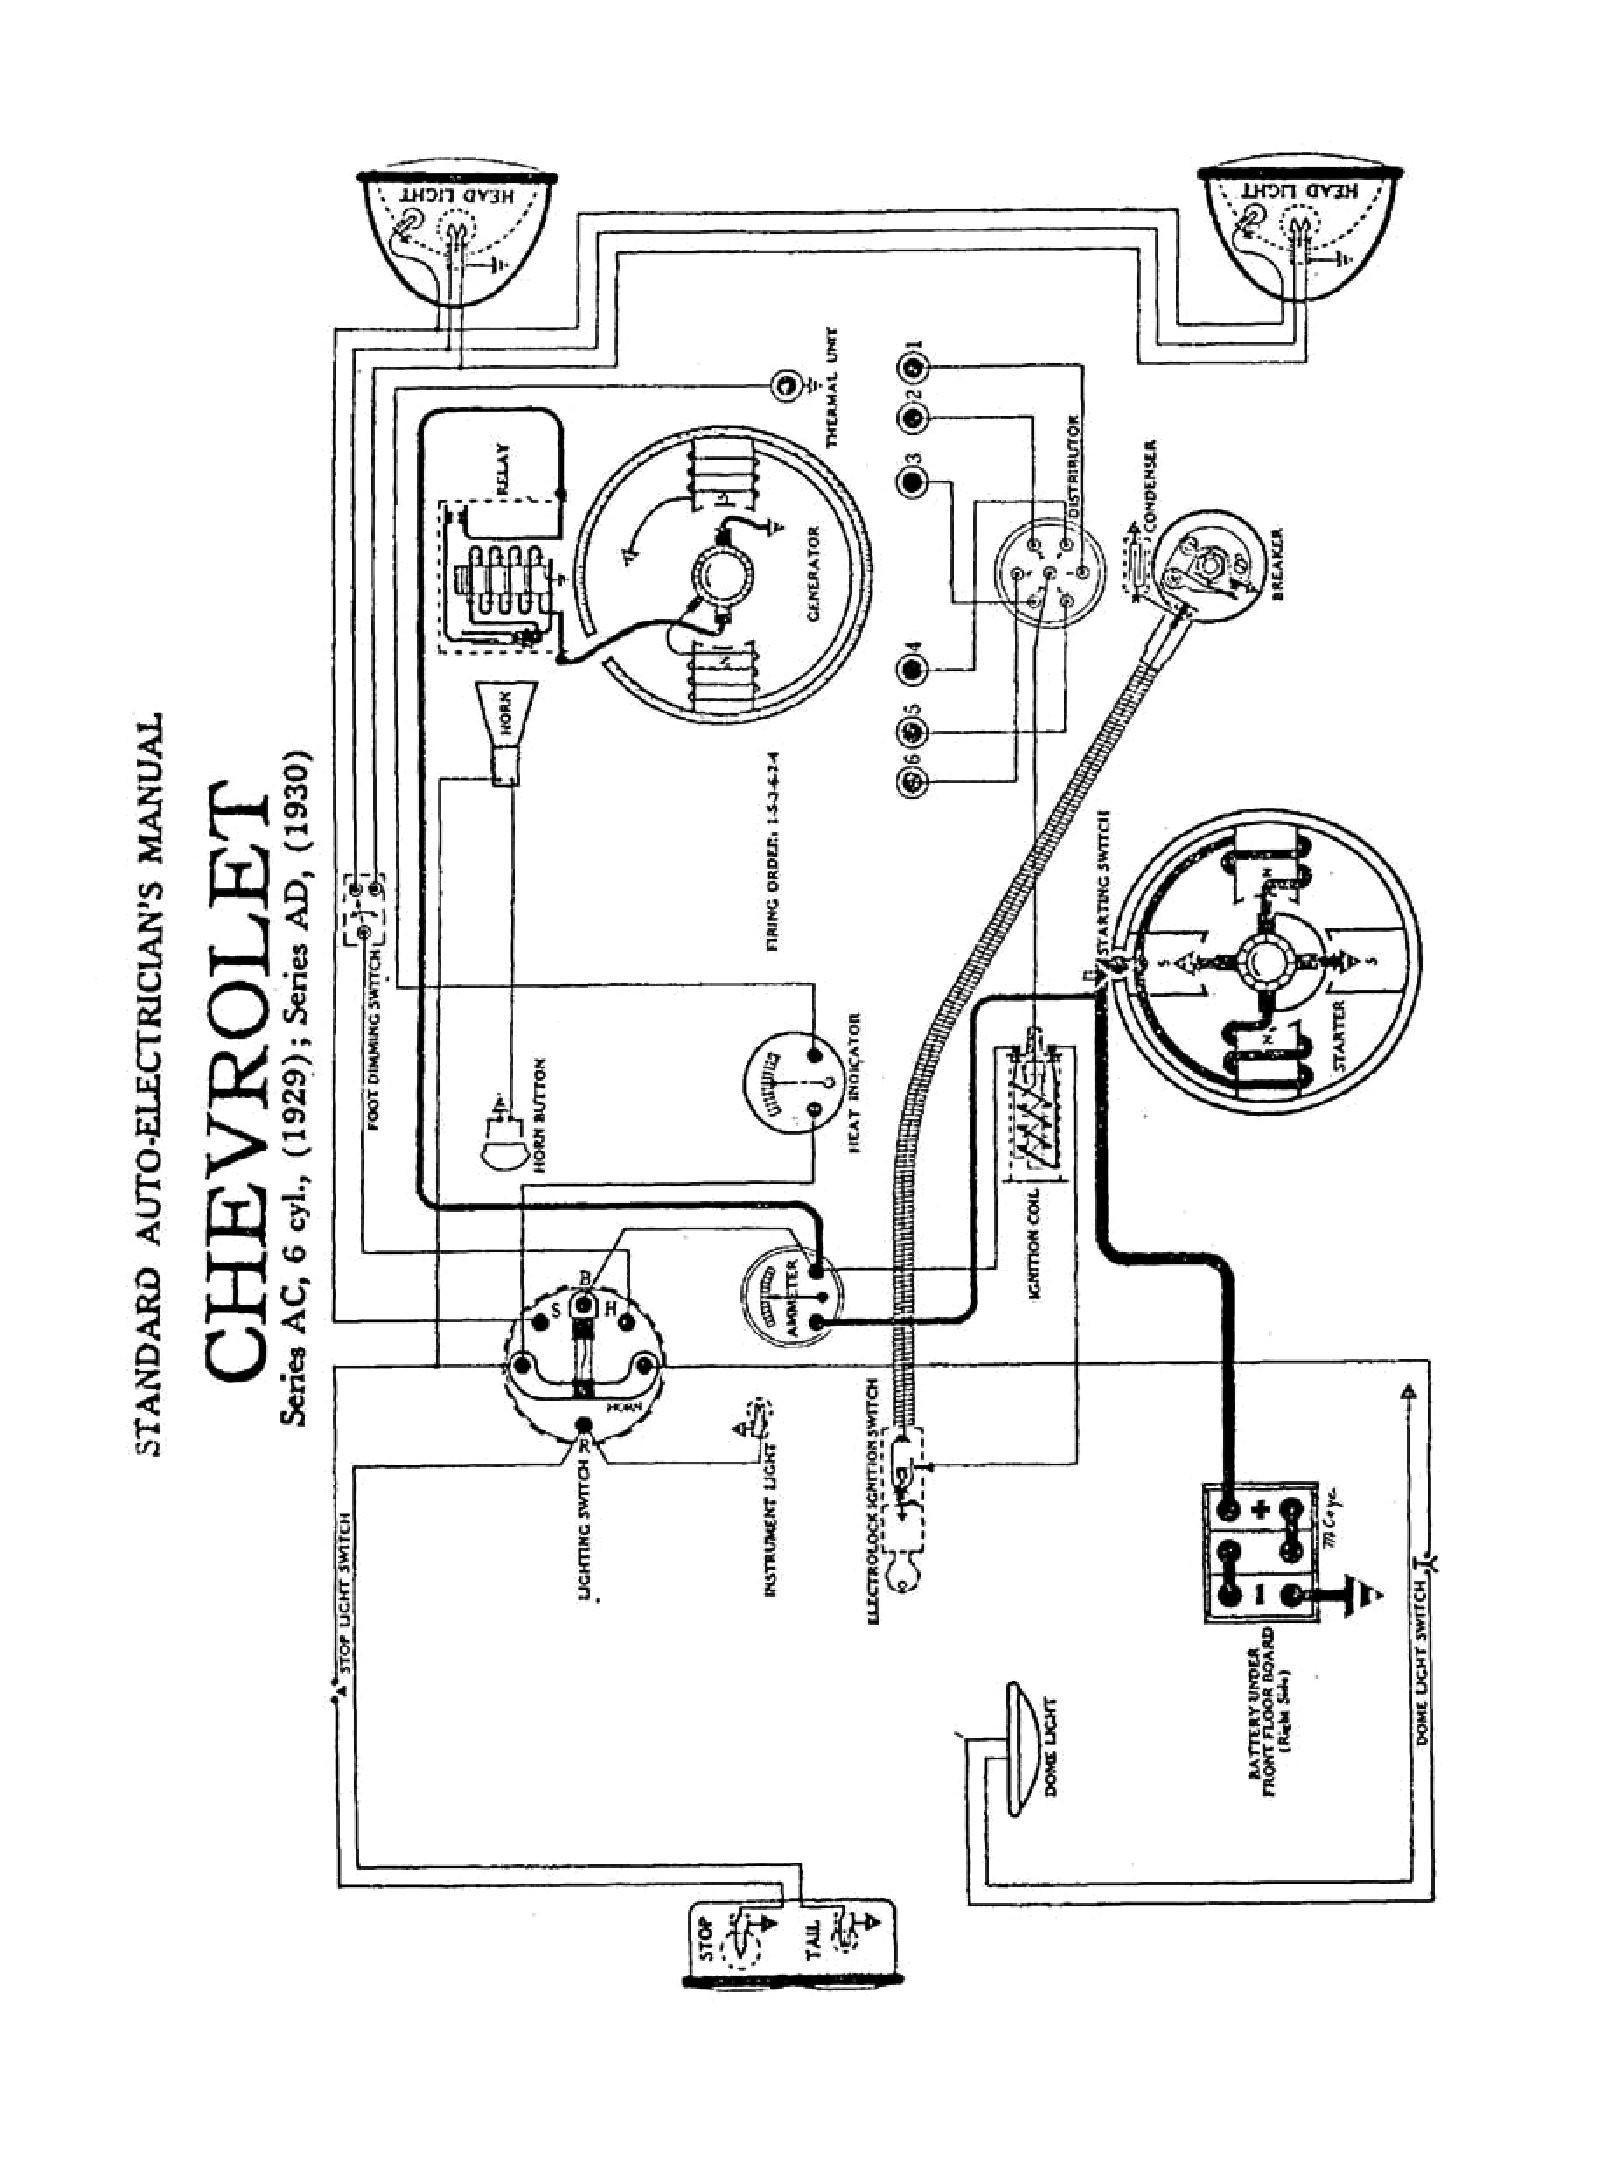 Volvo Etm Wiring Diagram Apktodownload